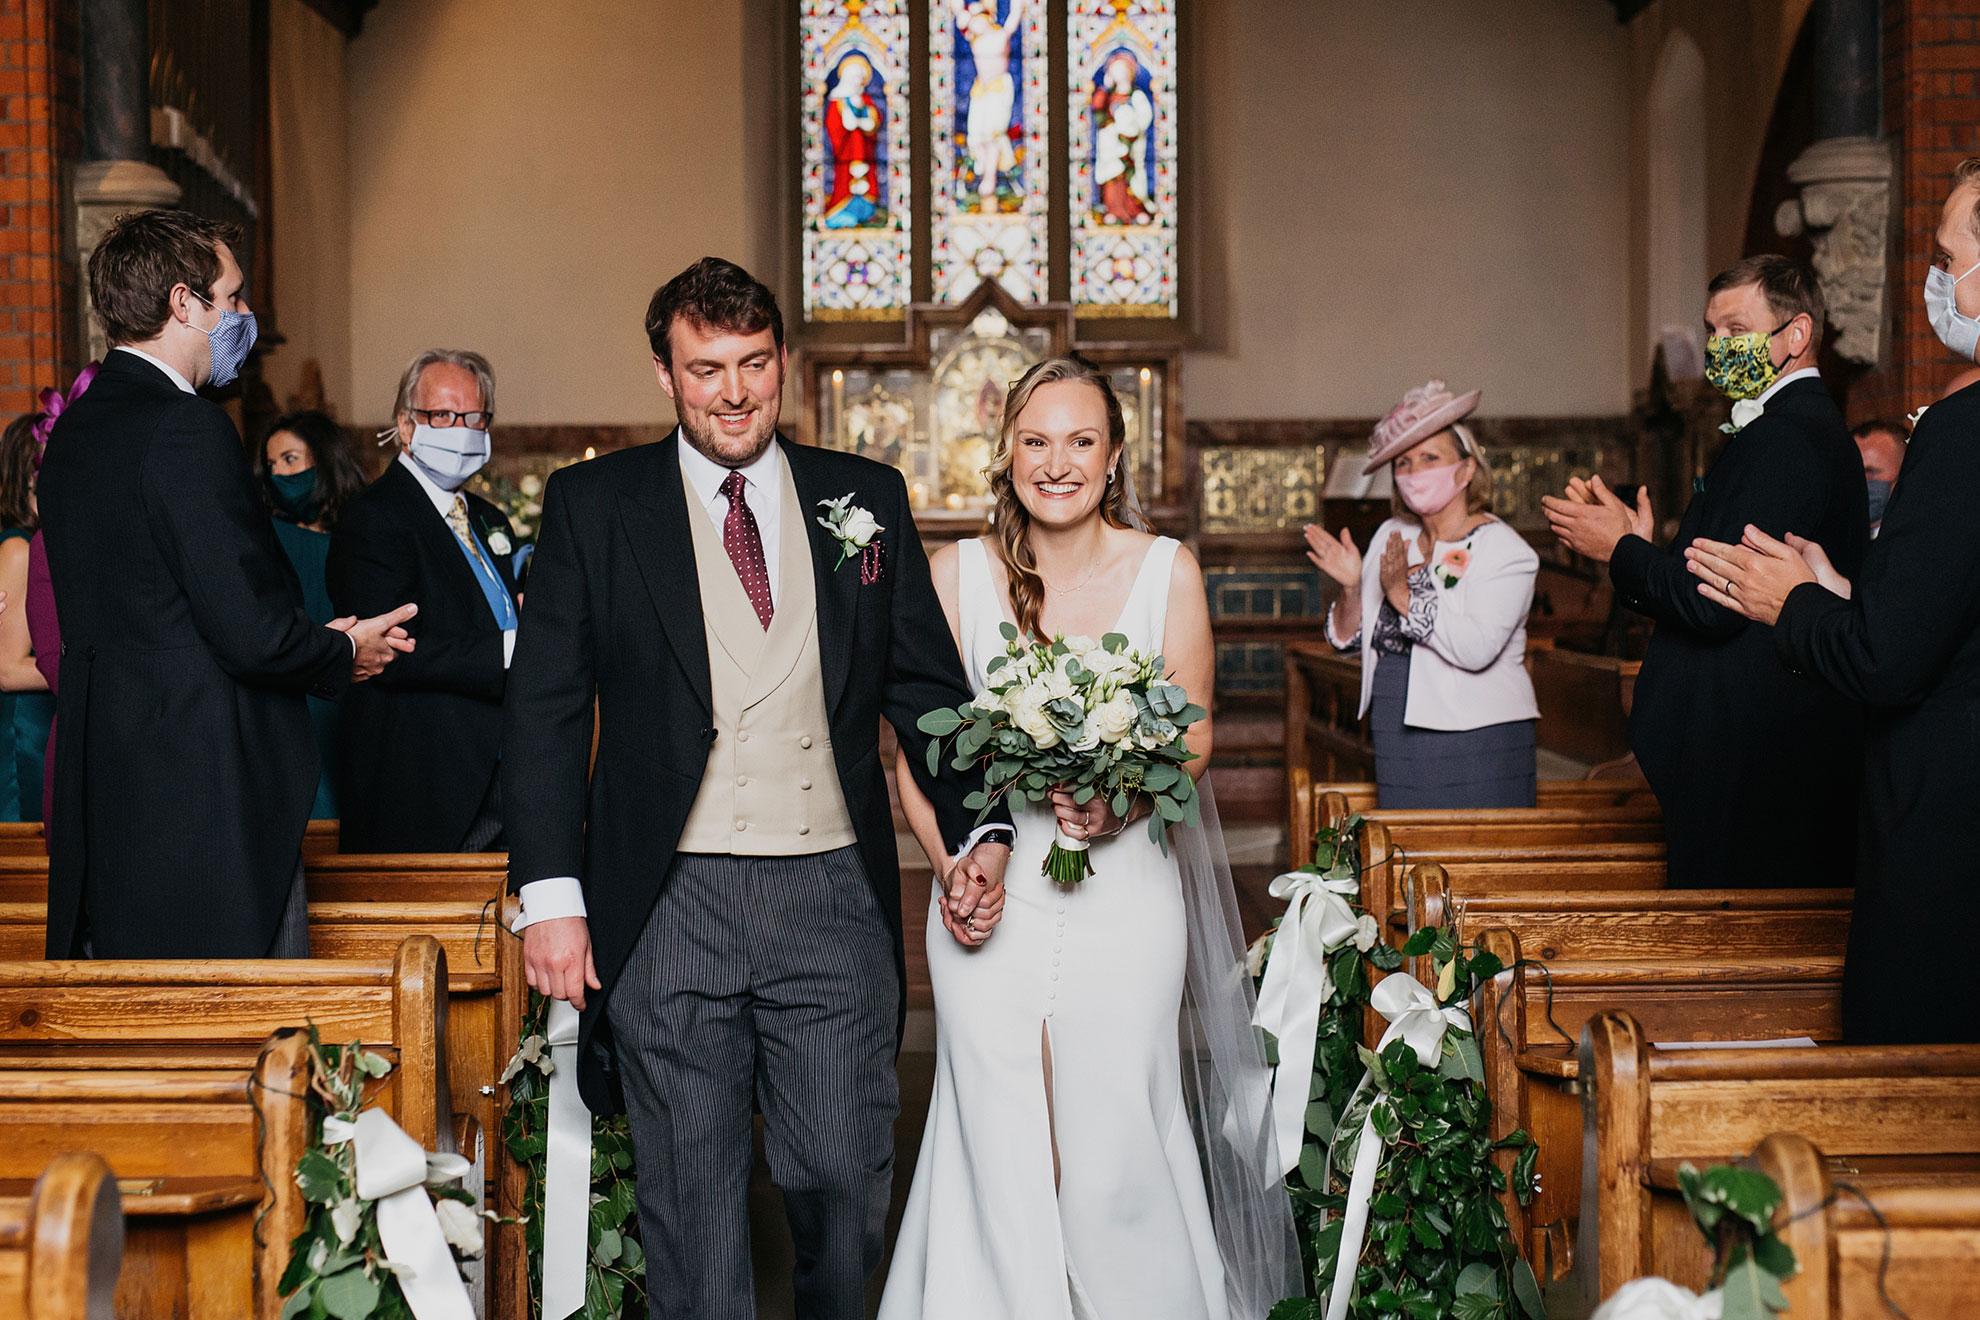 Initimate weddings